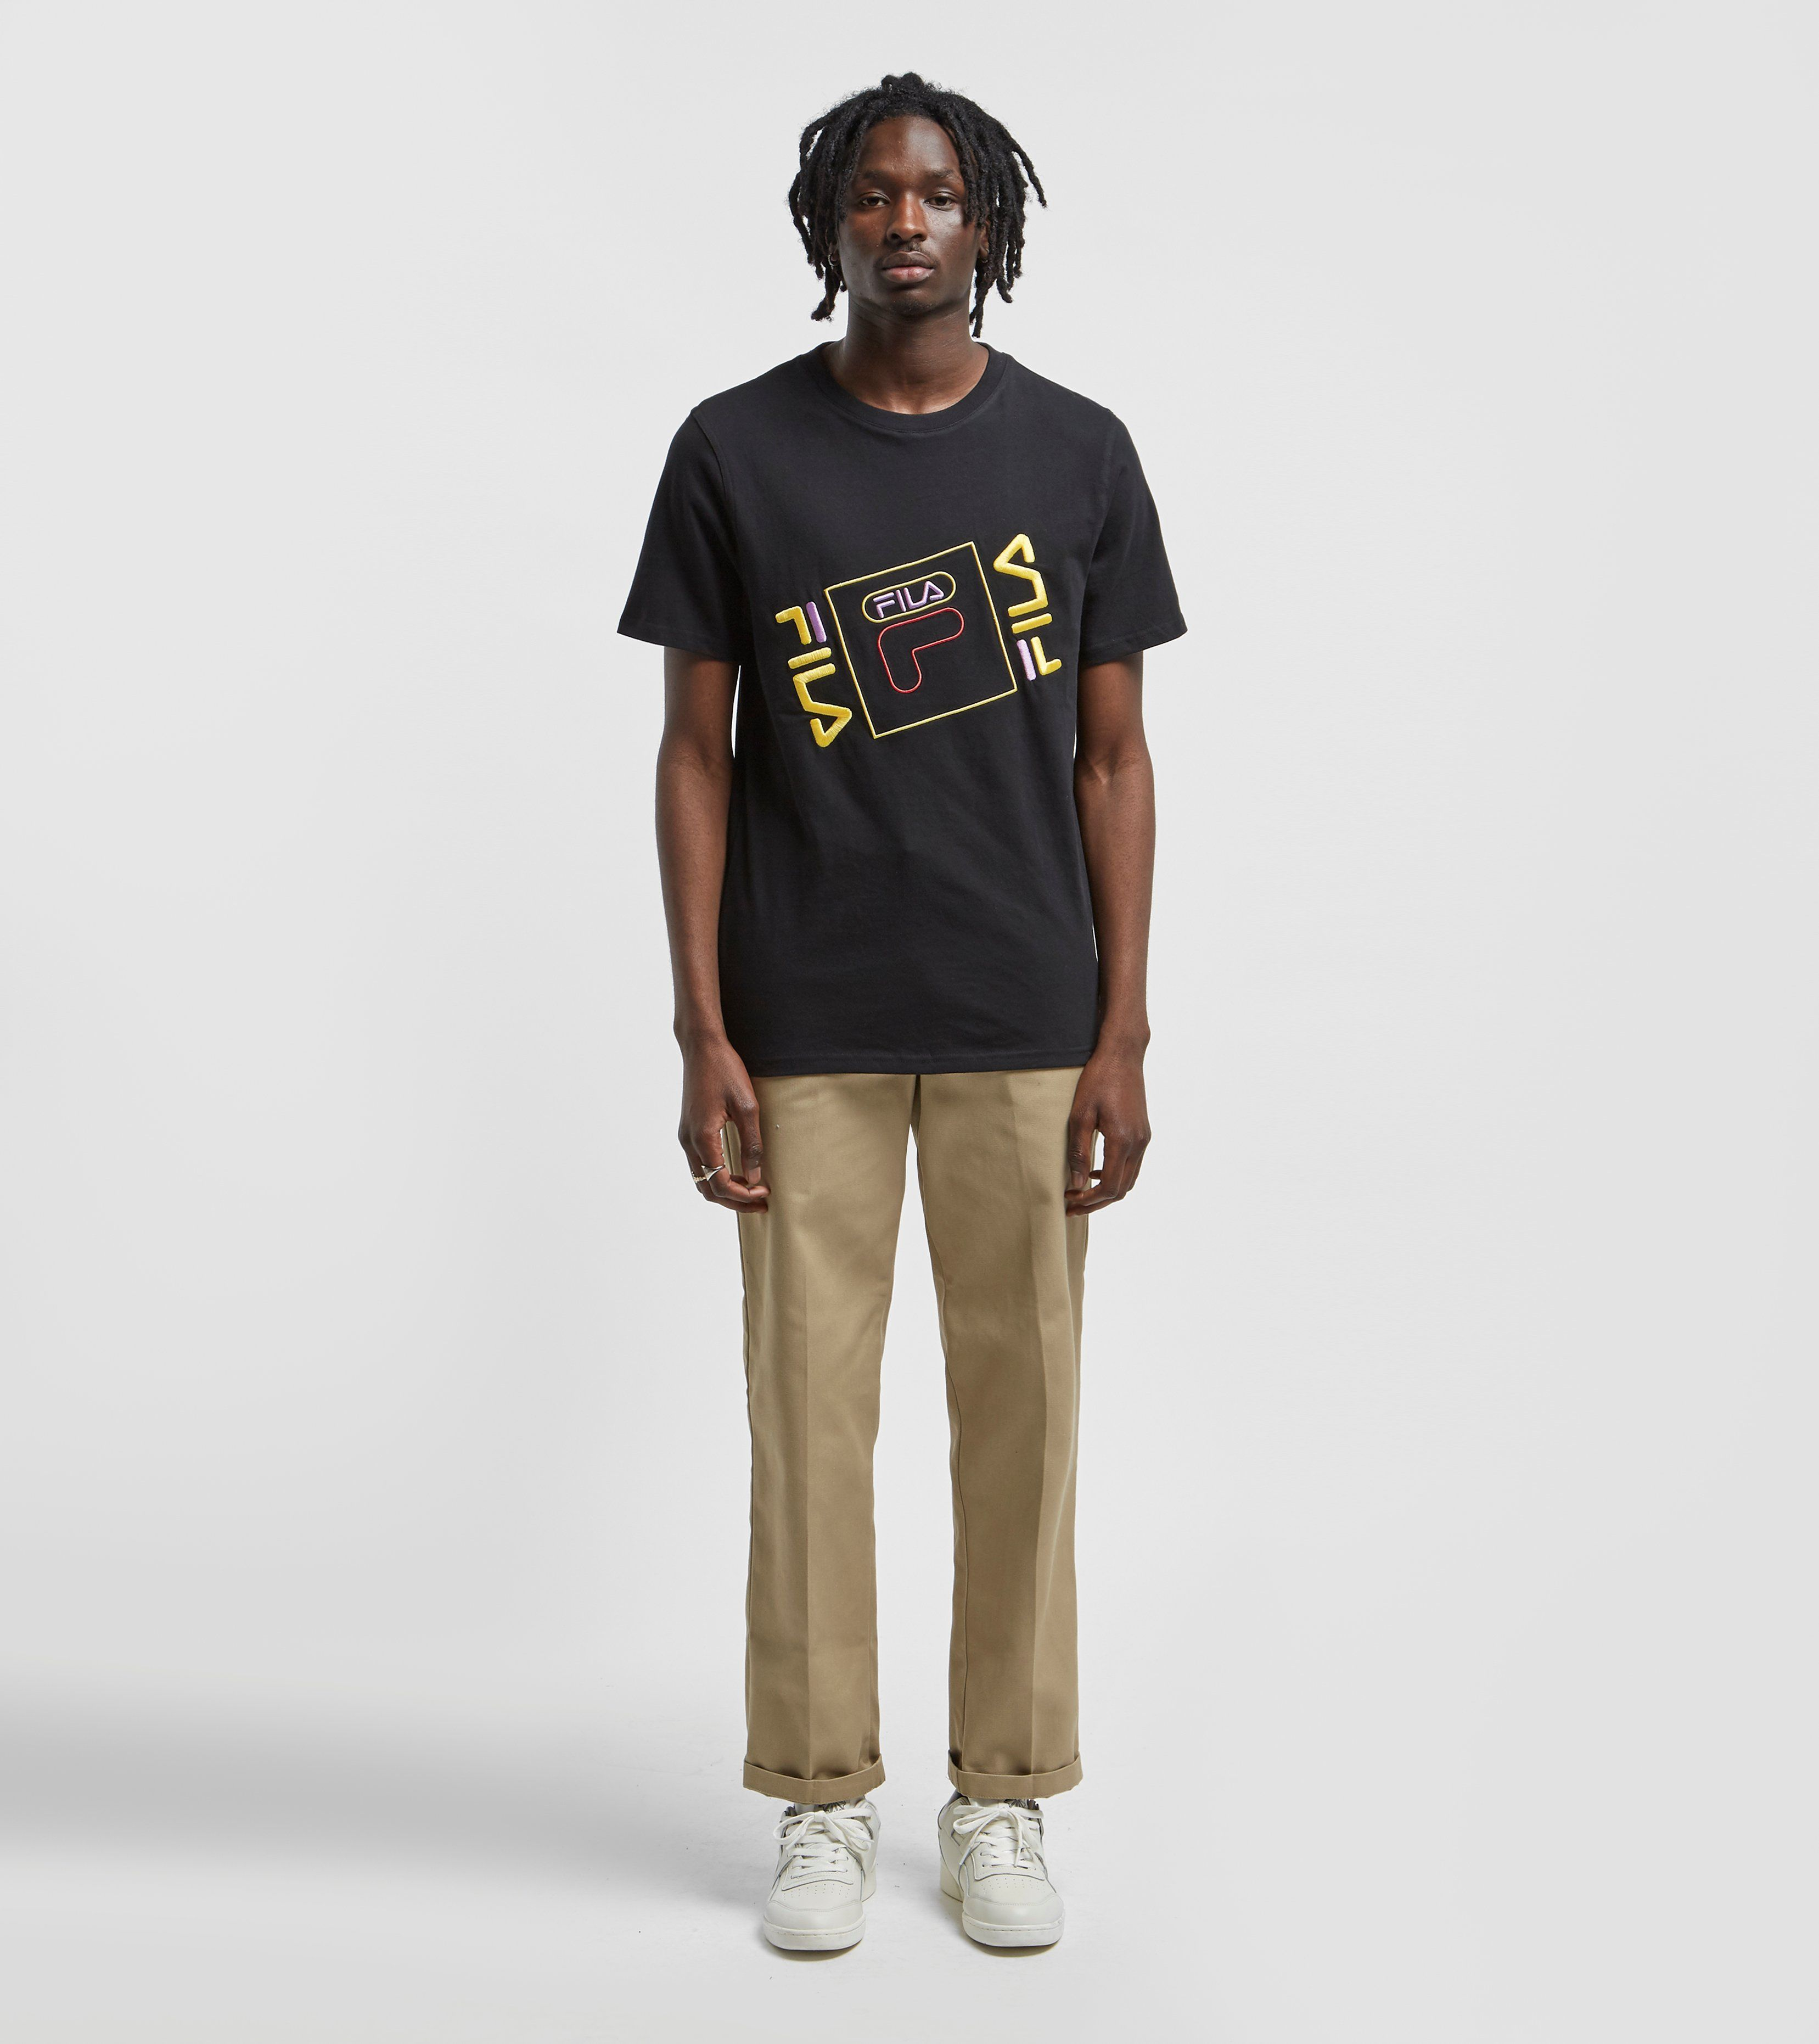 Fila Catria T-Shirt - size? Exclusive